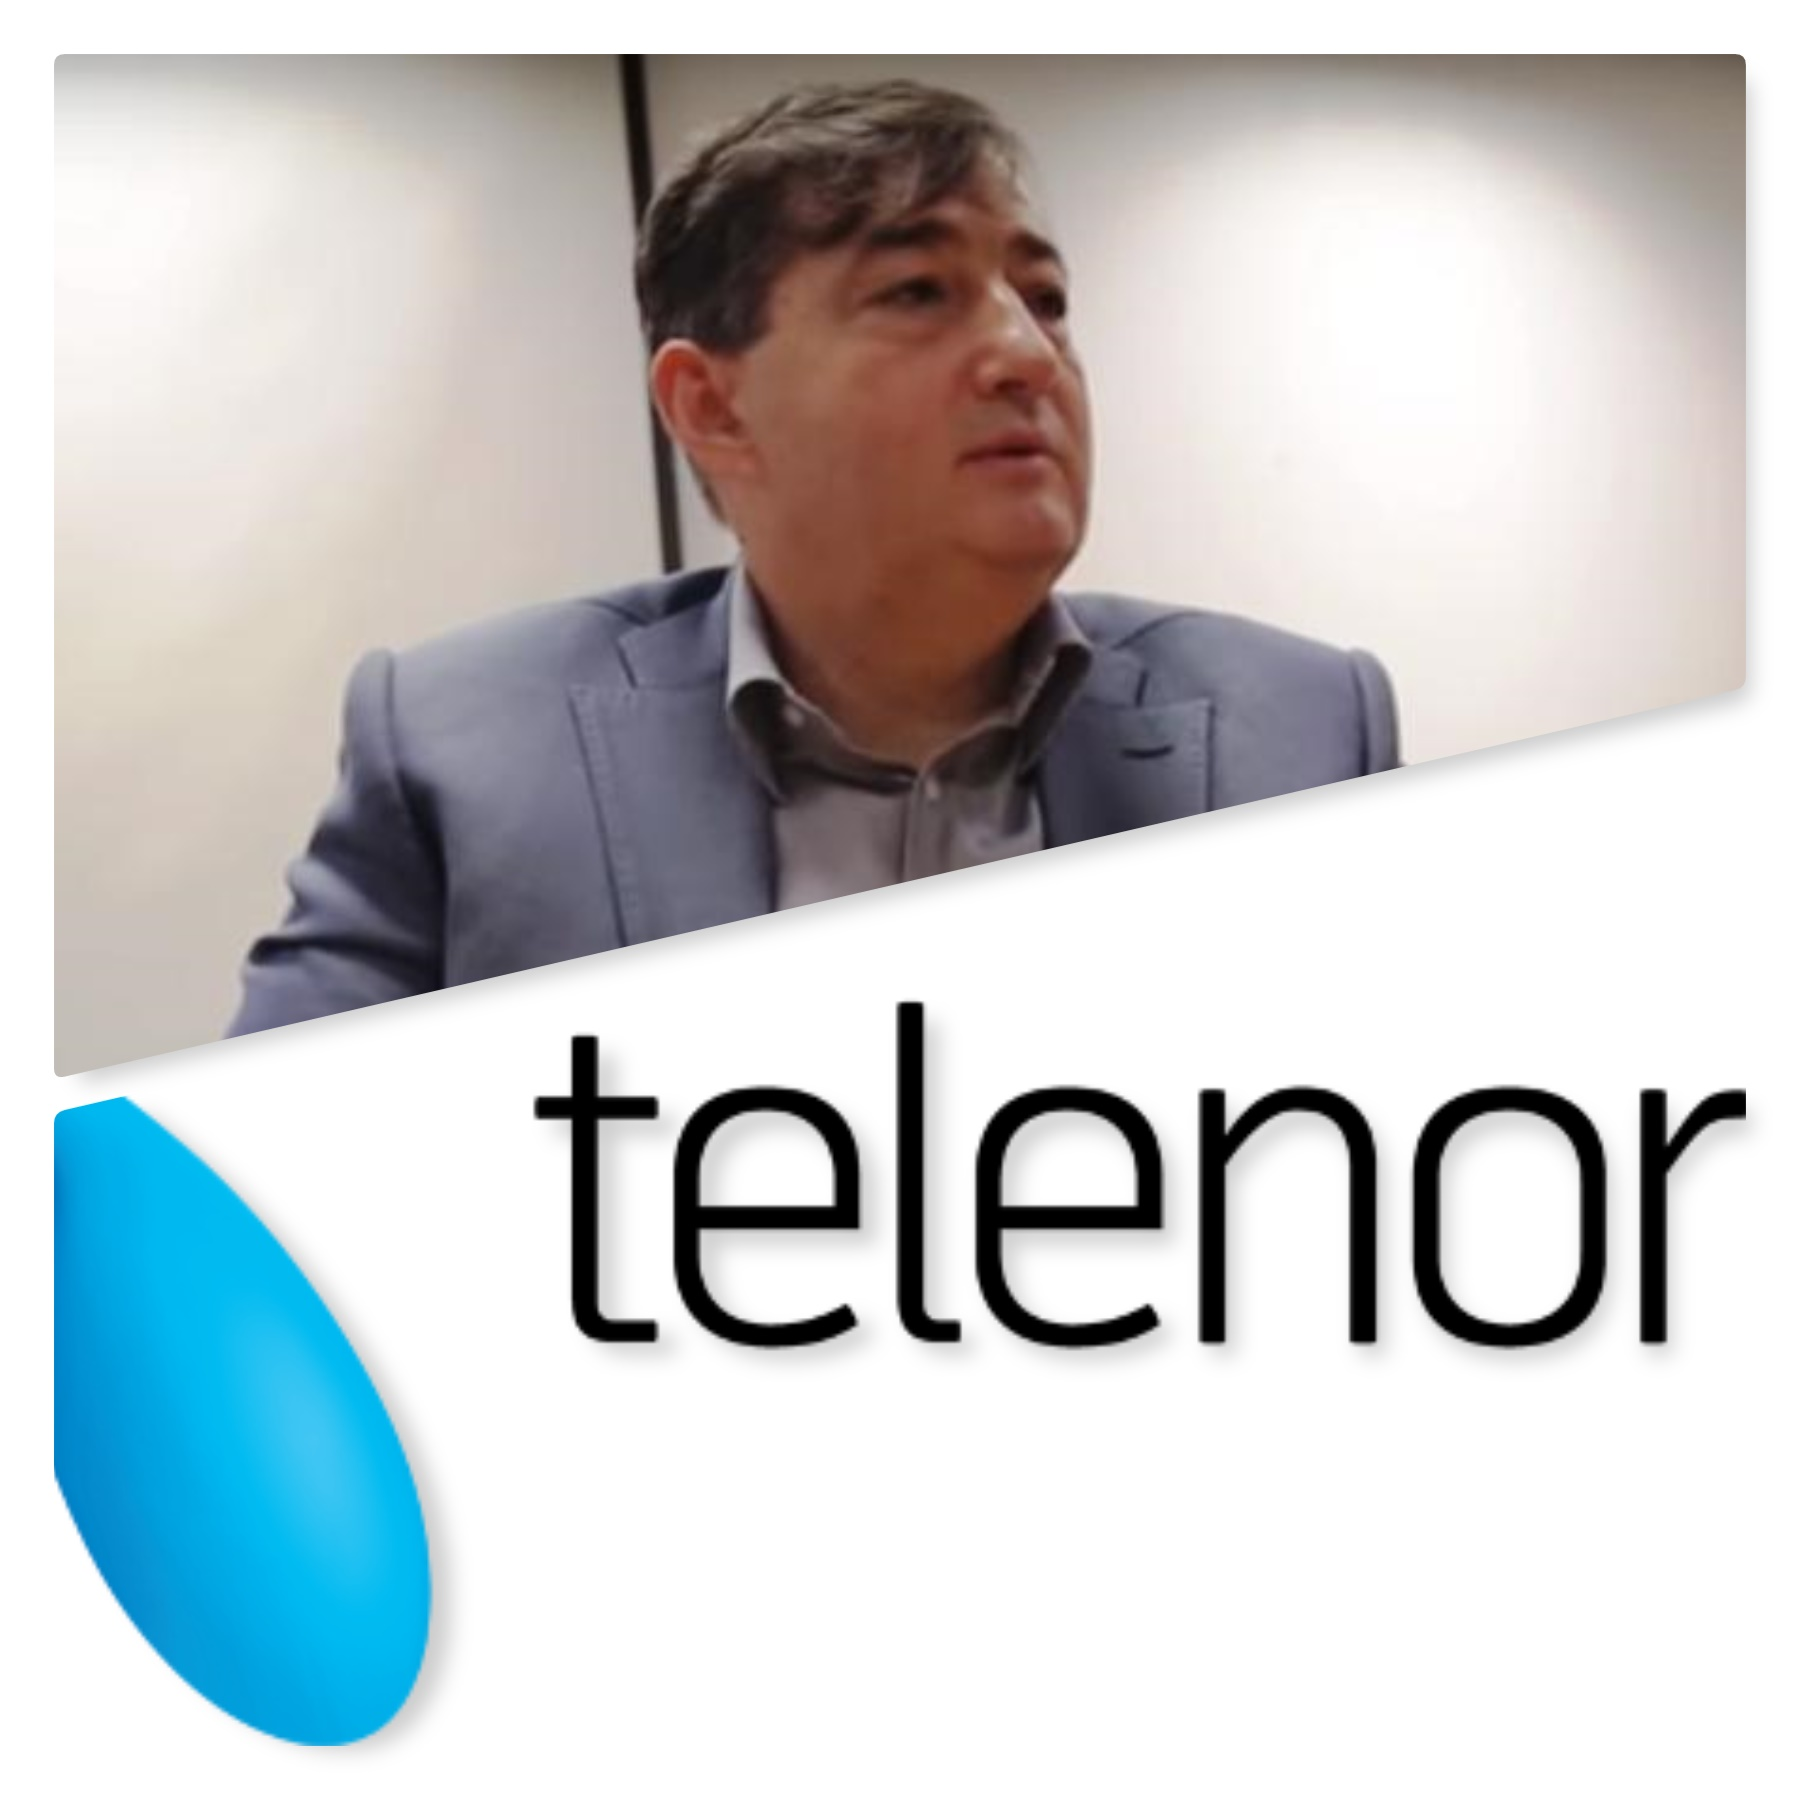 telenor_lorinc.jpg